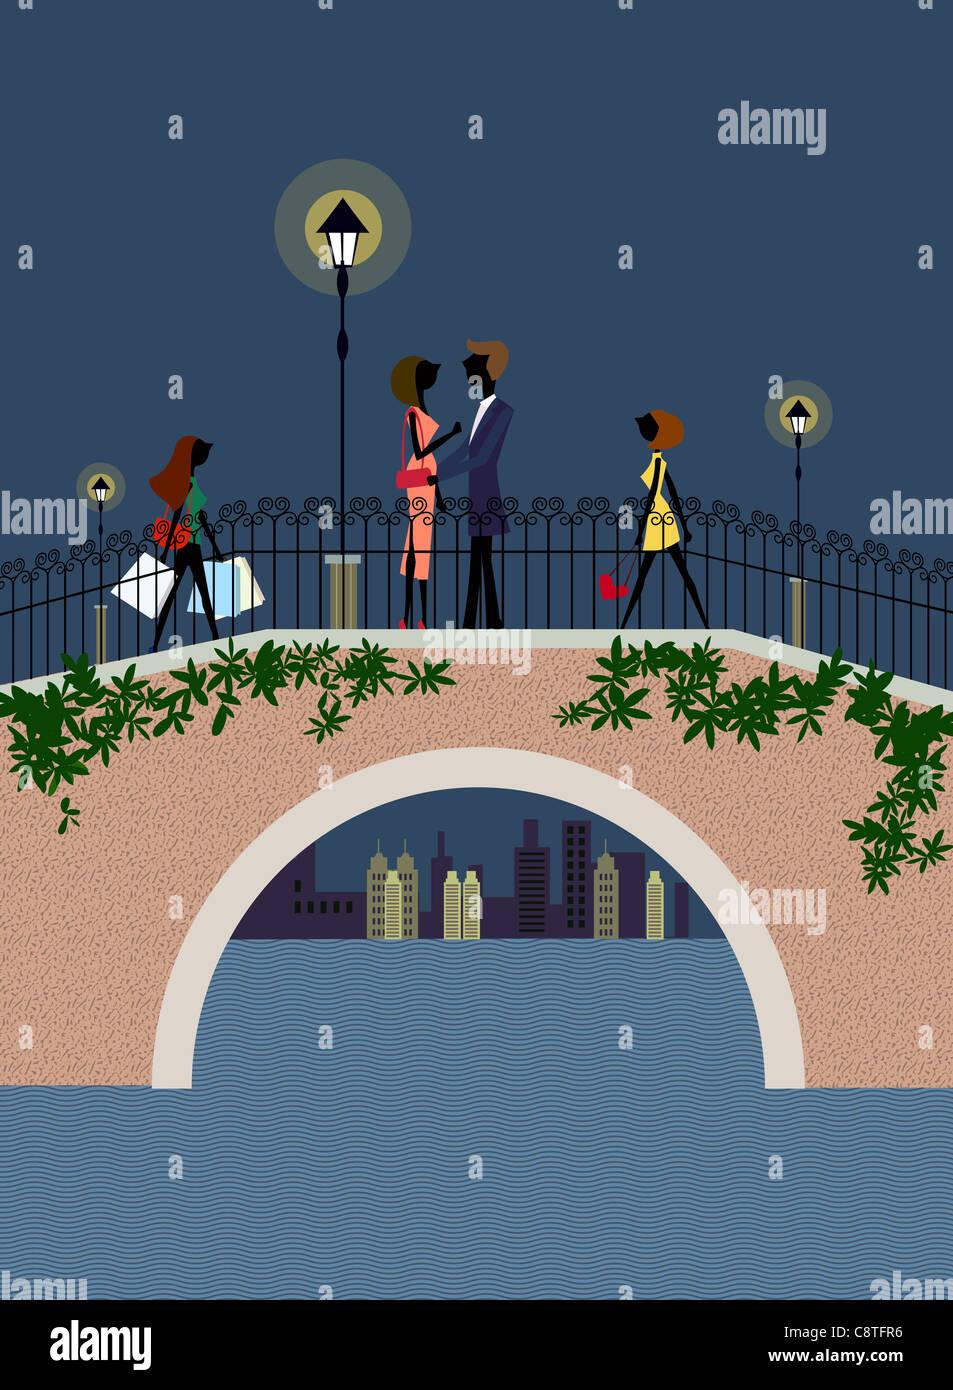 Couple Making Love On Foot Bridge At Night - Stock Image